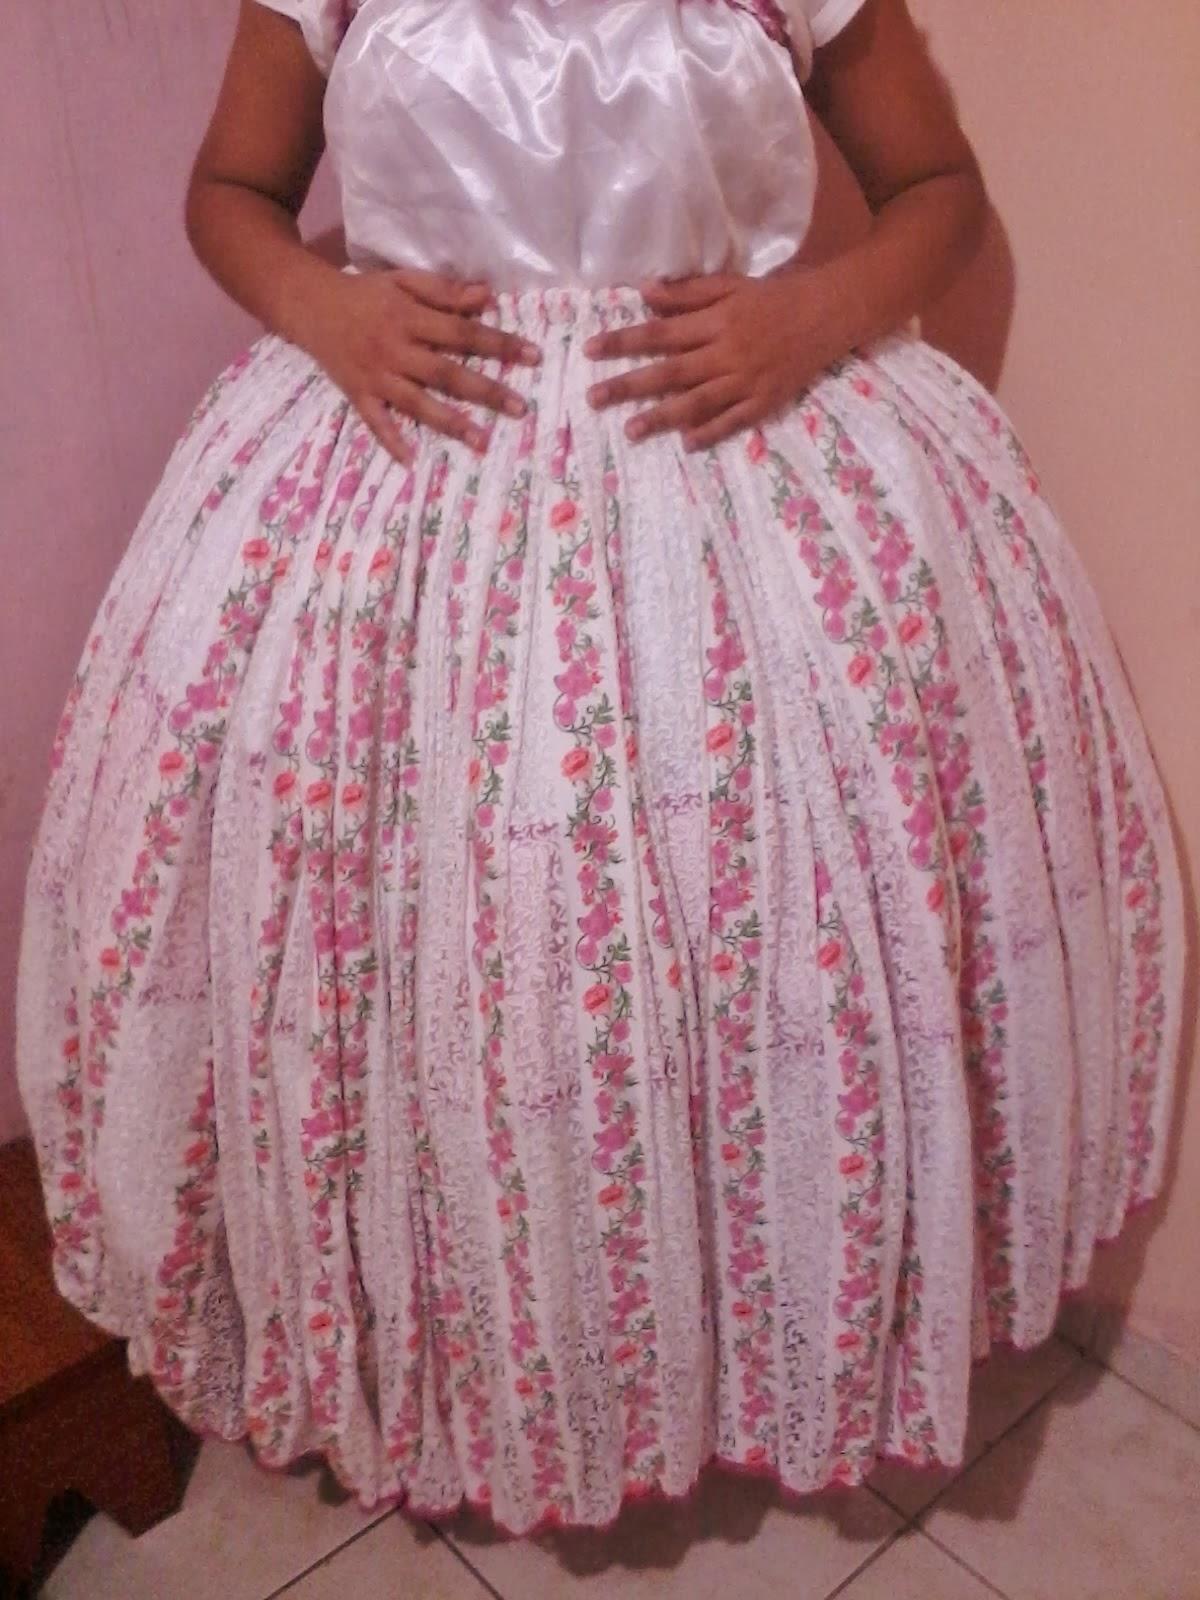 Por baixo do vestido da meguinha qui rabo - 2 part 7